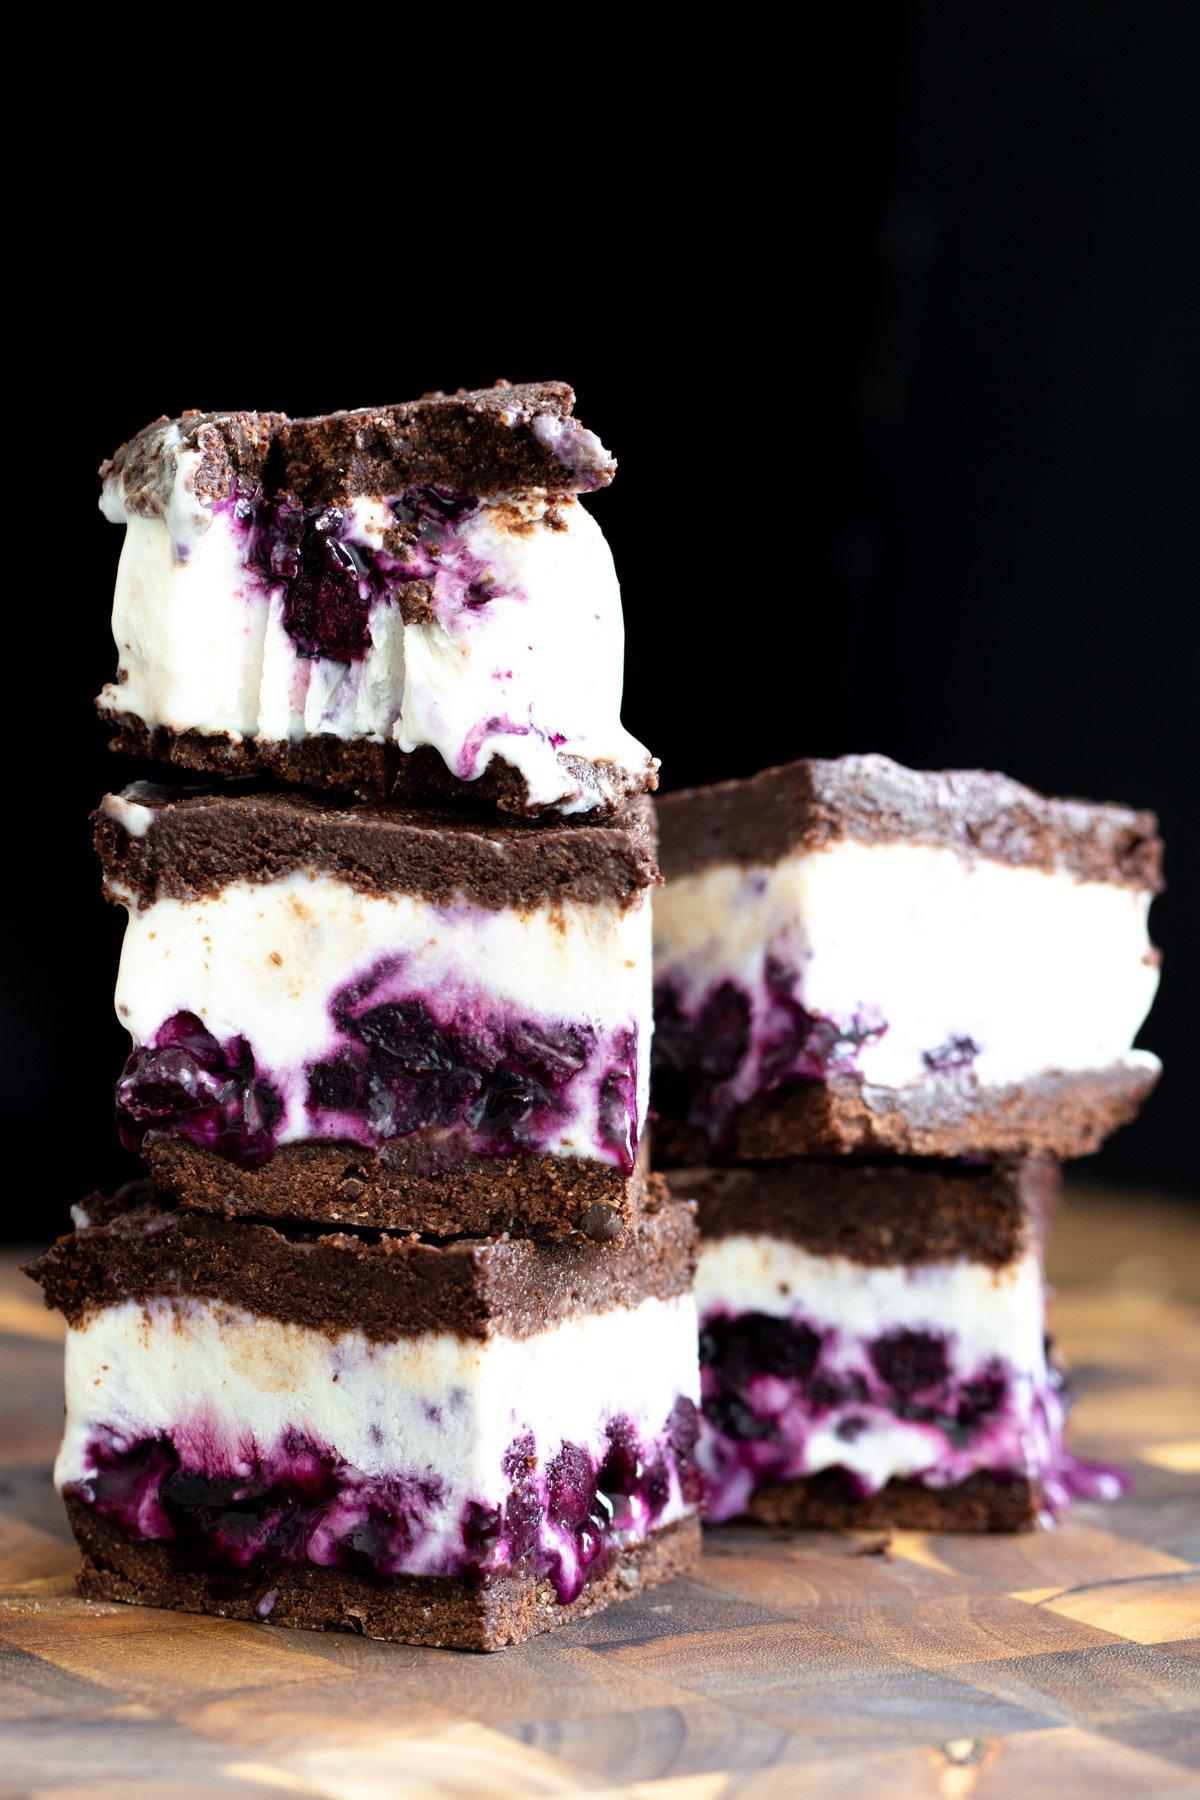 vegan chococolate vanilla ice cream sandwiches on a wooden board